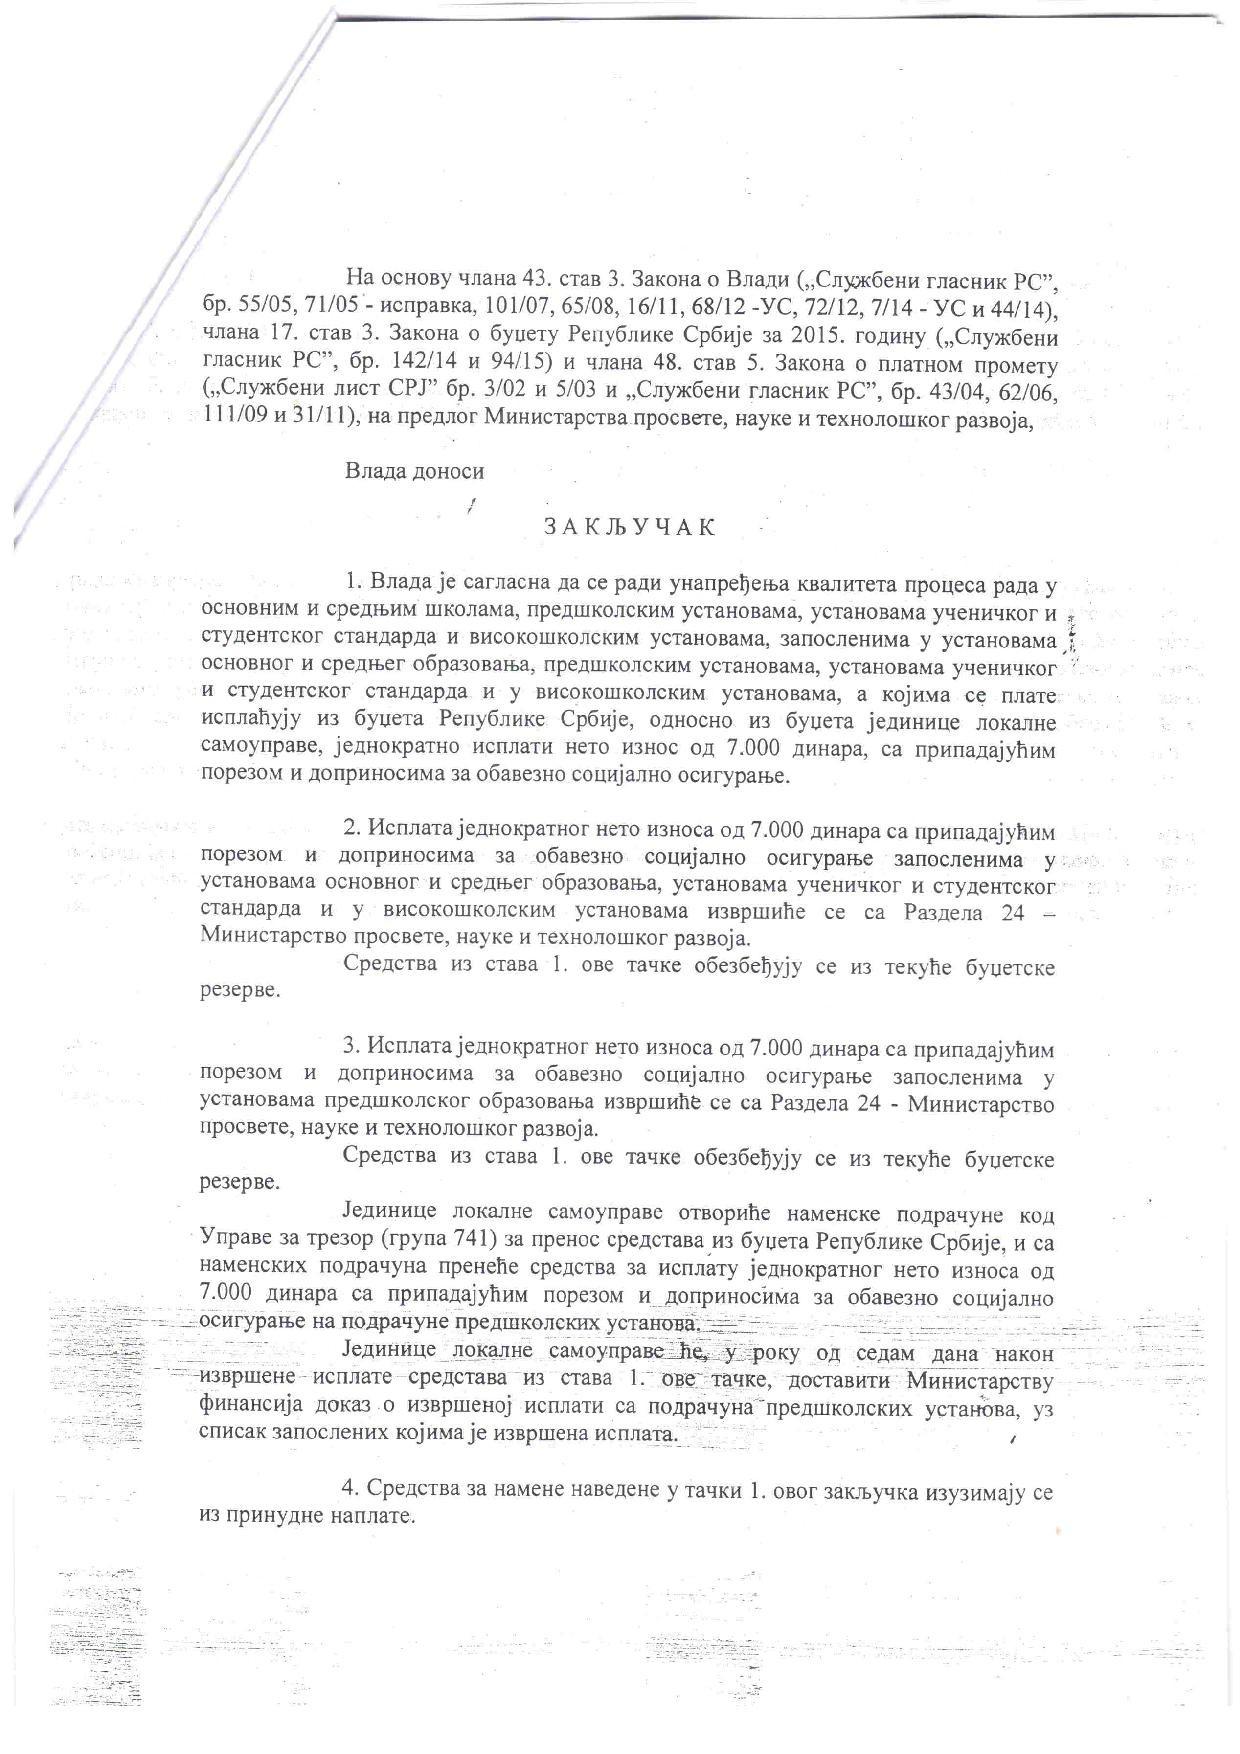 2. Dopis Ministra prosvete u vezi sa PU 22.12.2015-page-002